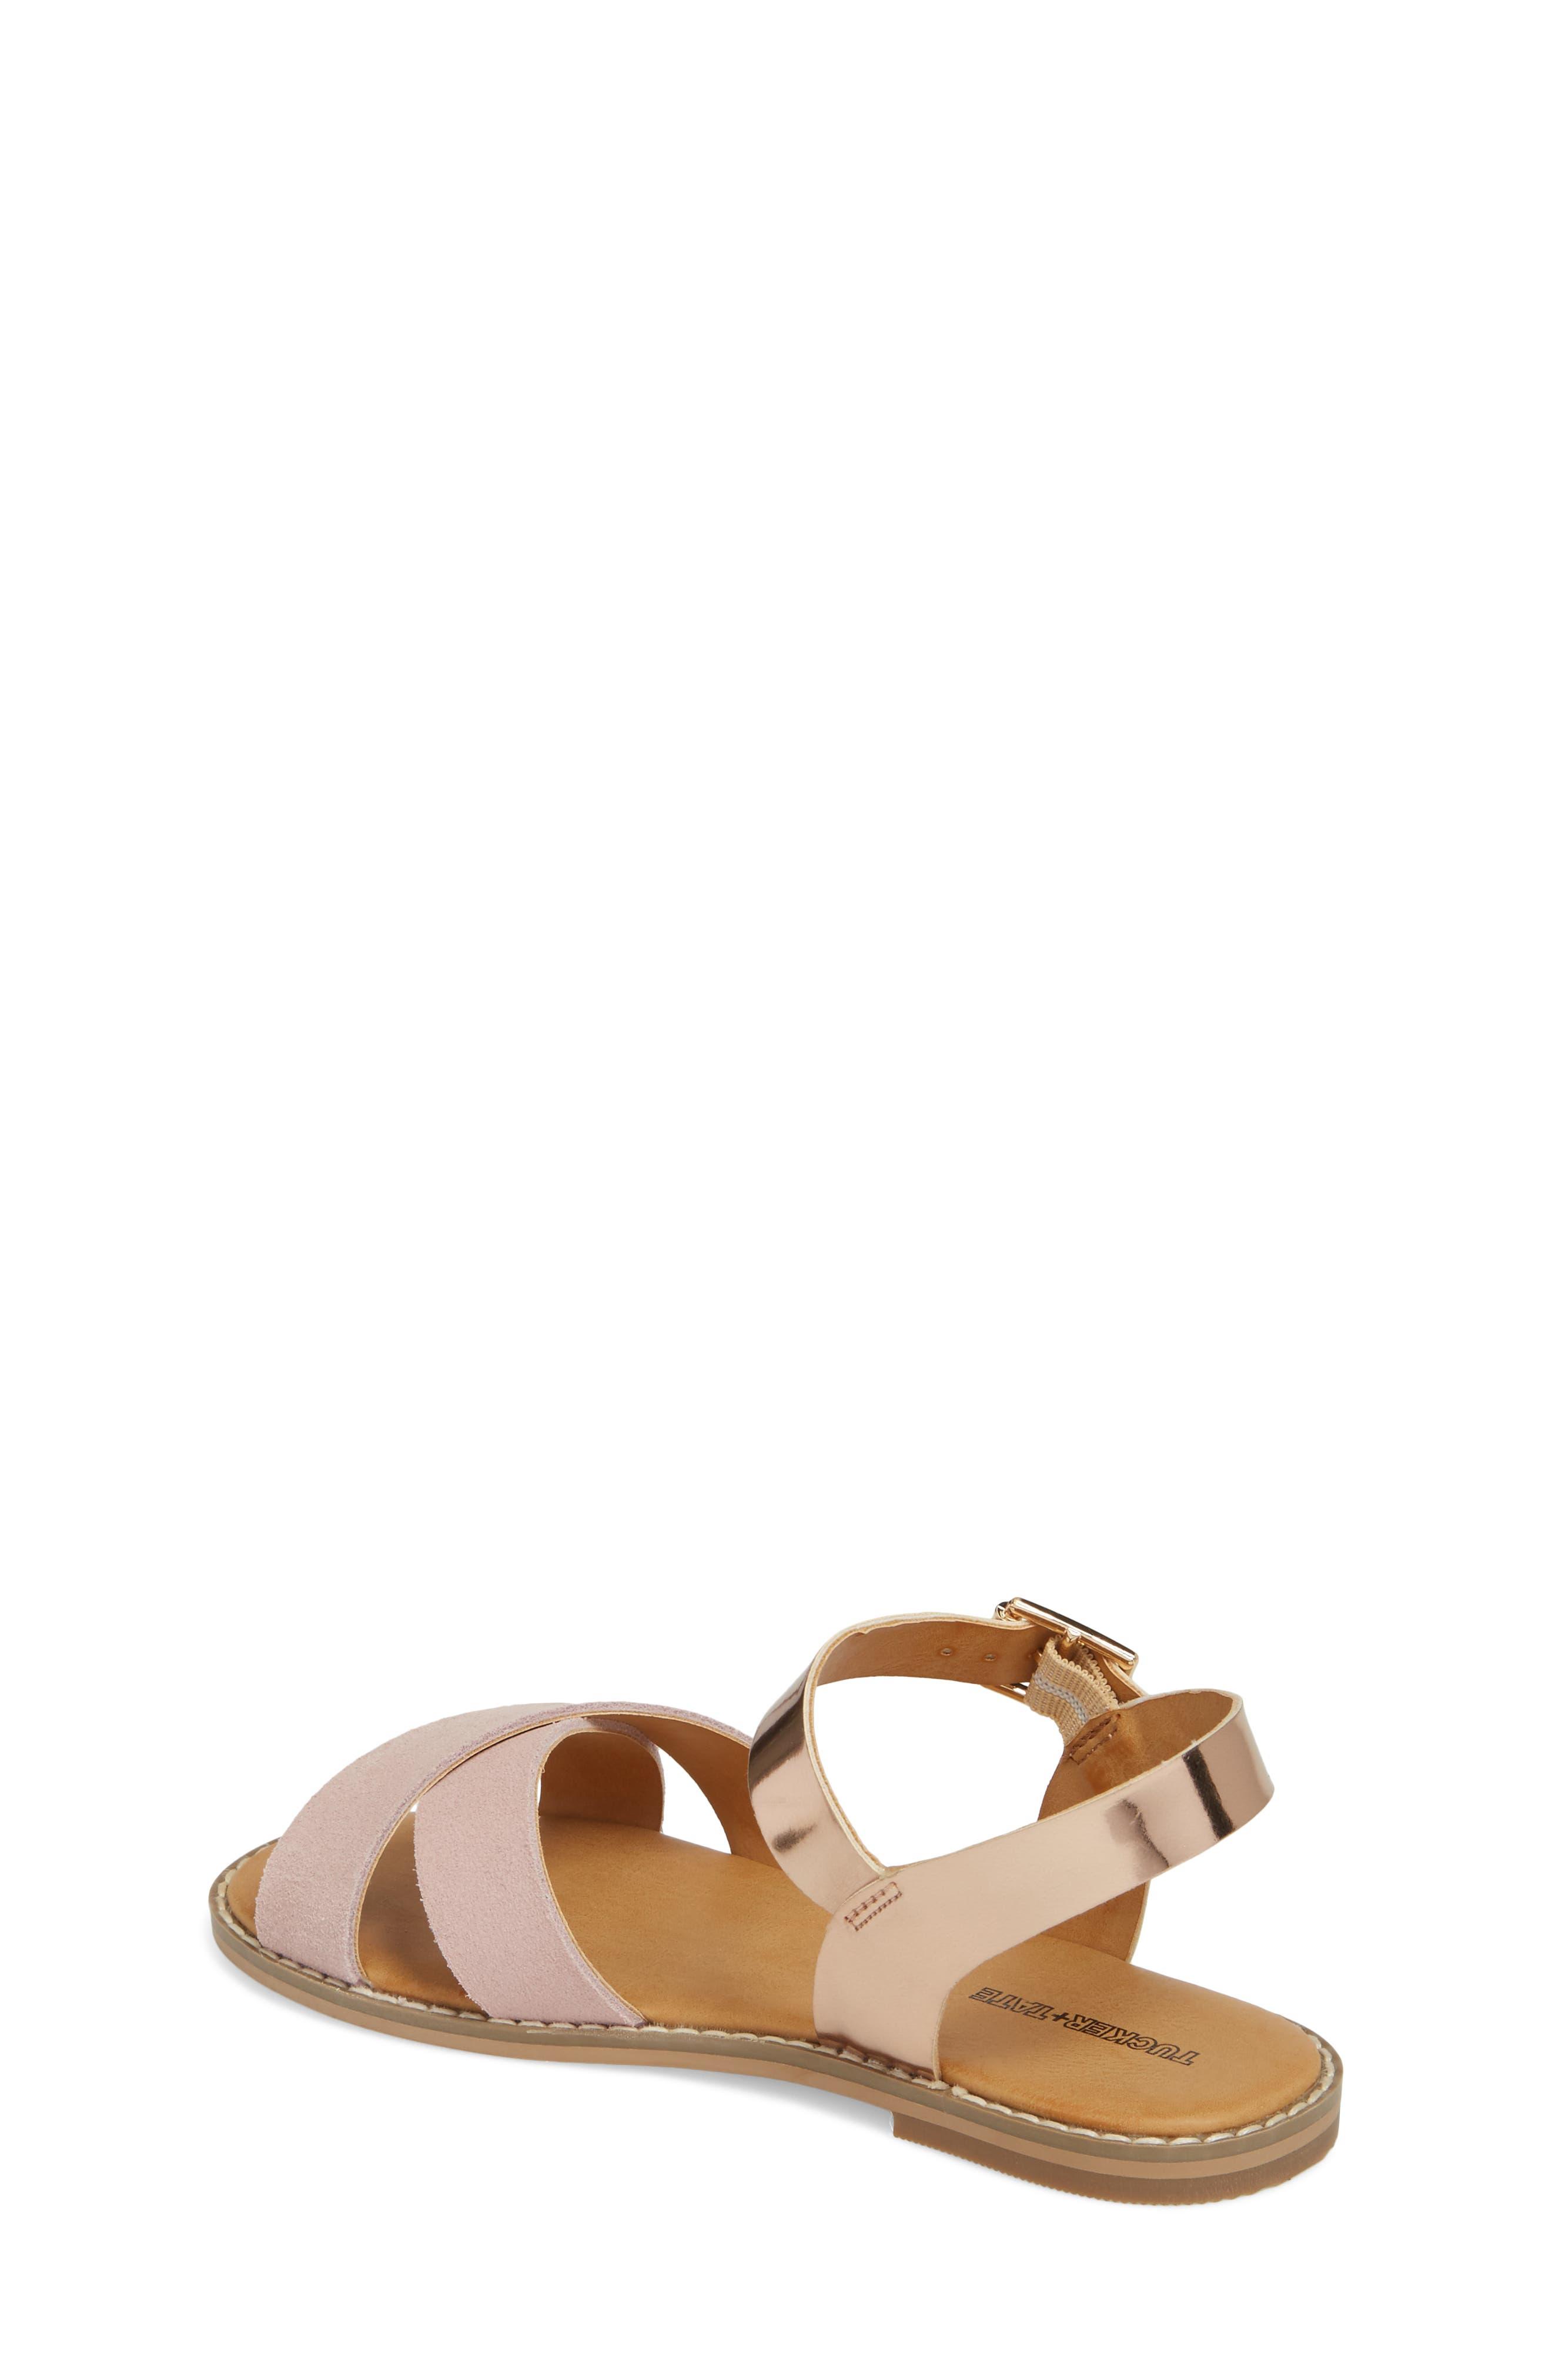 Arya Cross Strap Sandal,                             Alternate thumbnail 3, color,                             Rose Gold Faux Lea